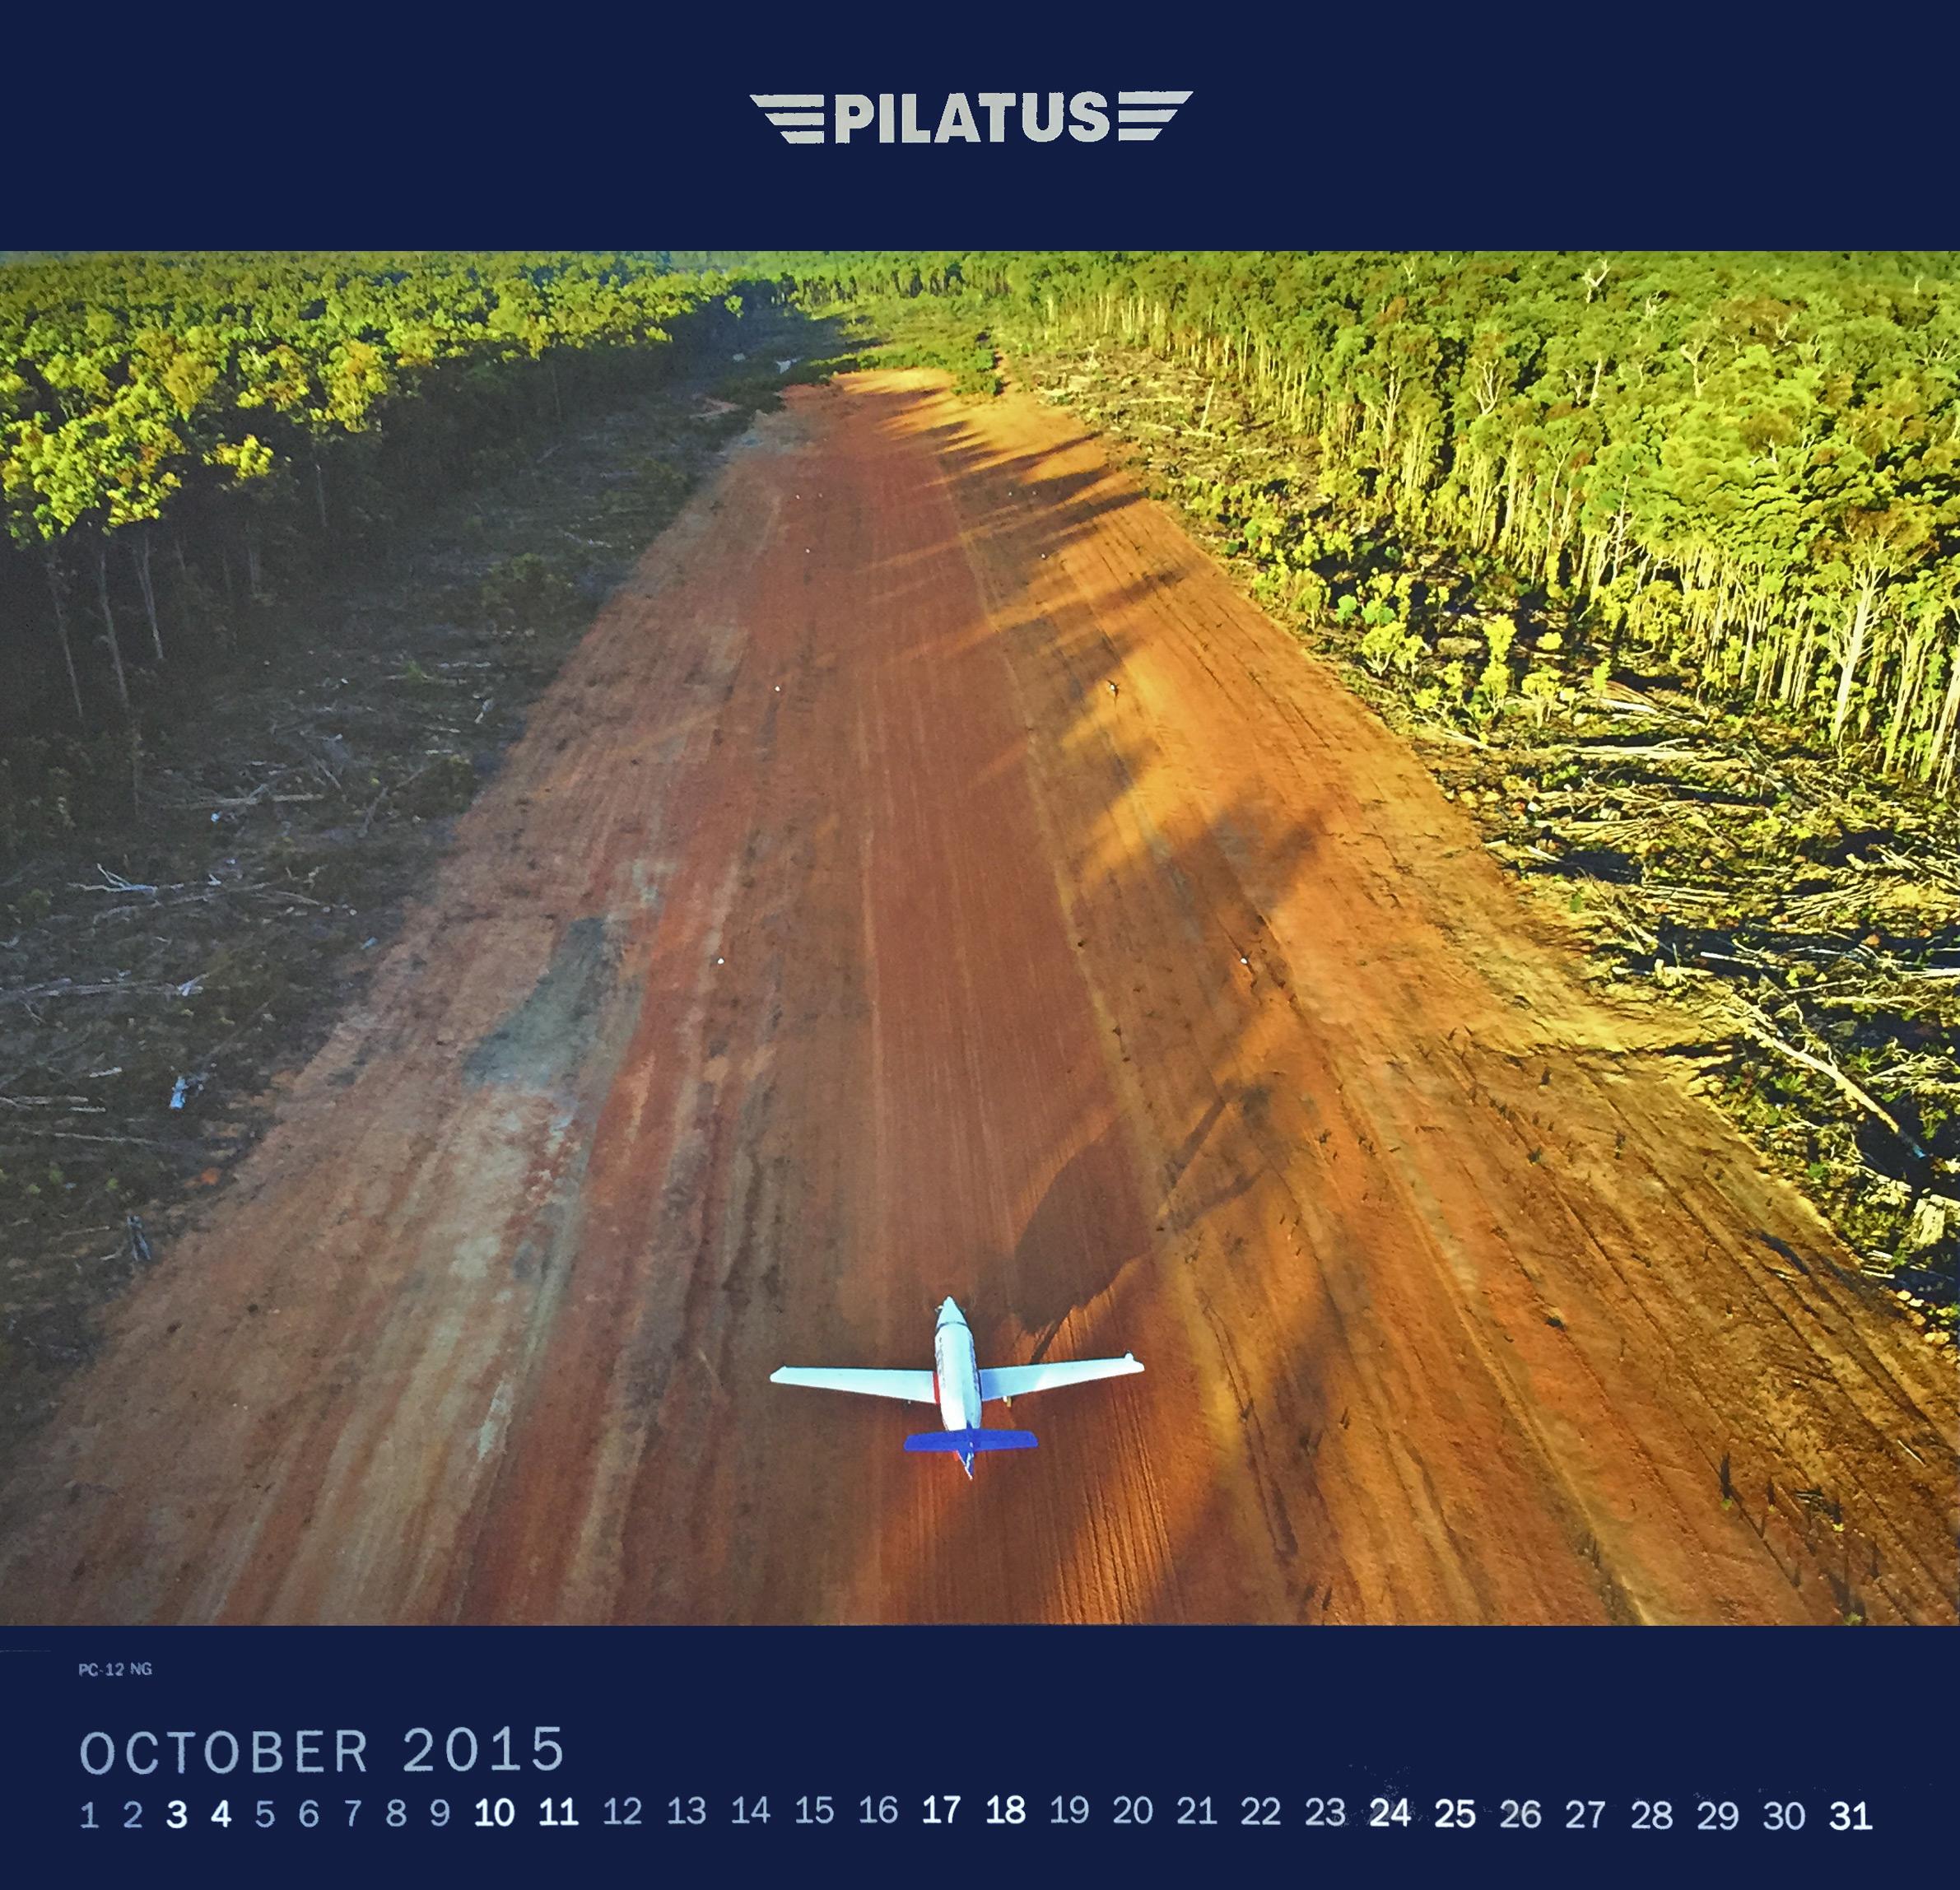 Dwellingup airstrip, Western Australia.